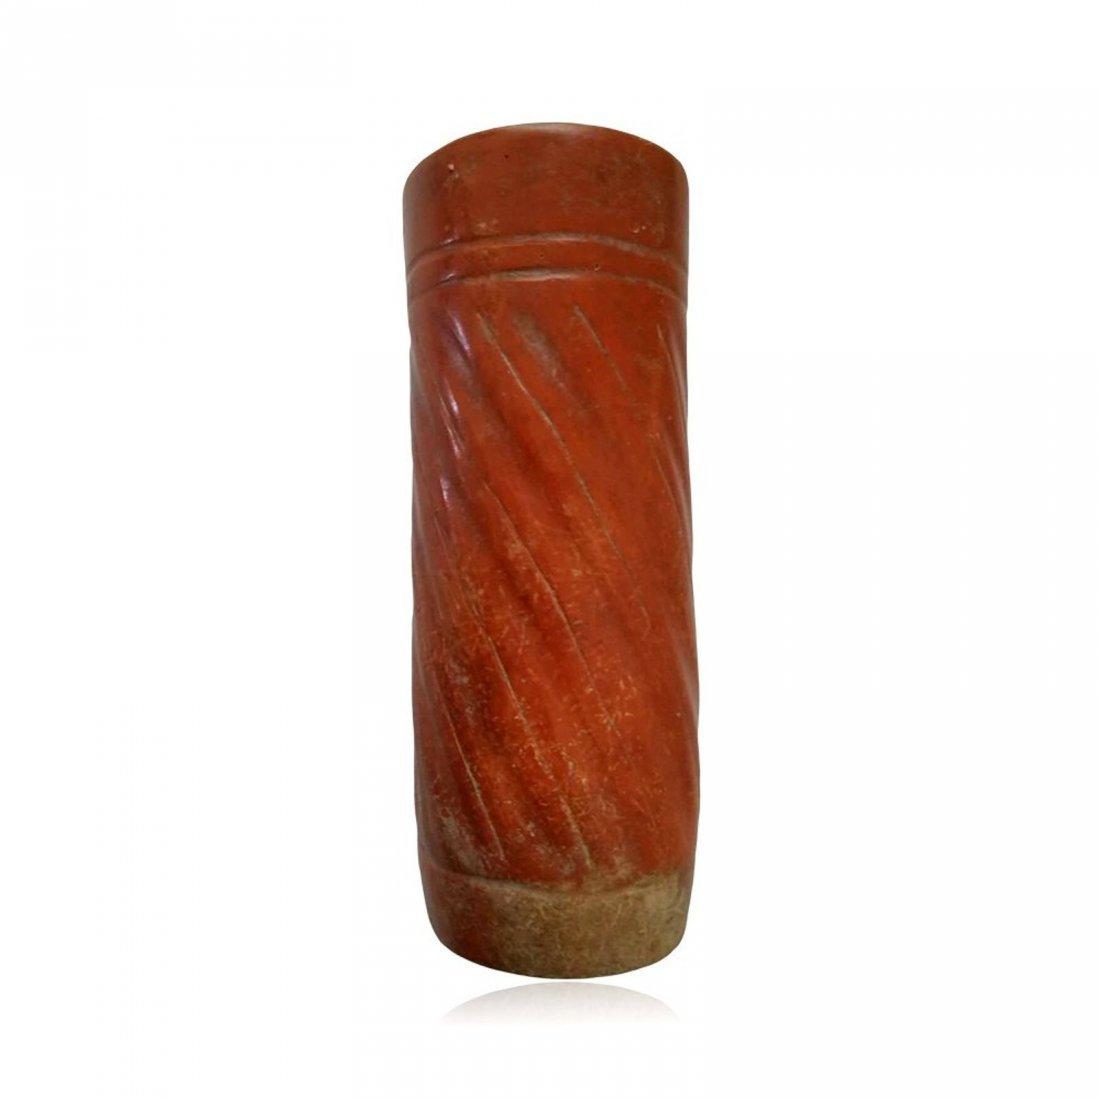 Pre-columbian Maya Orangeware Cylinder Vessel